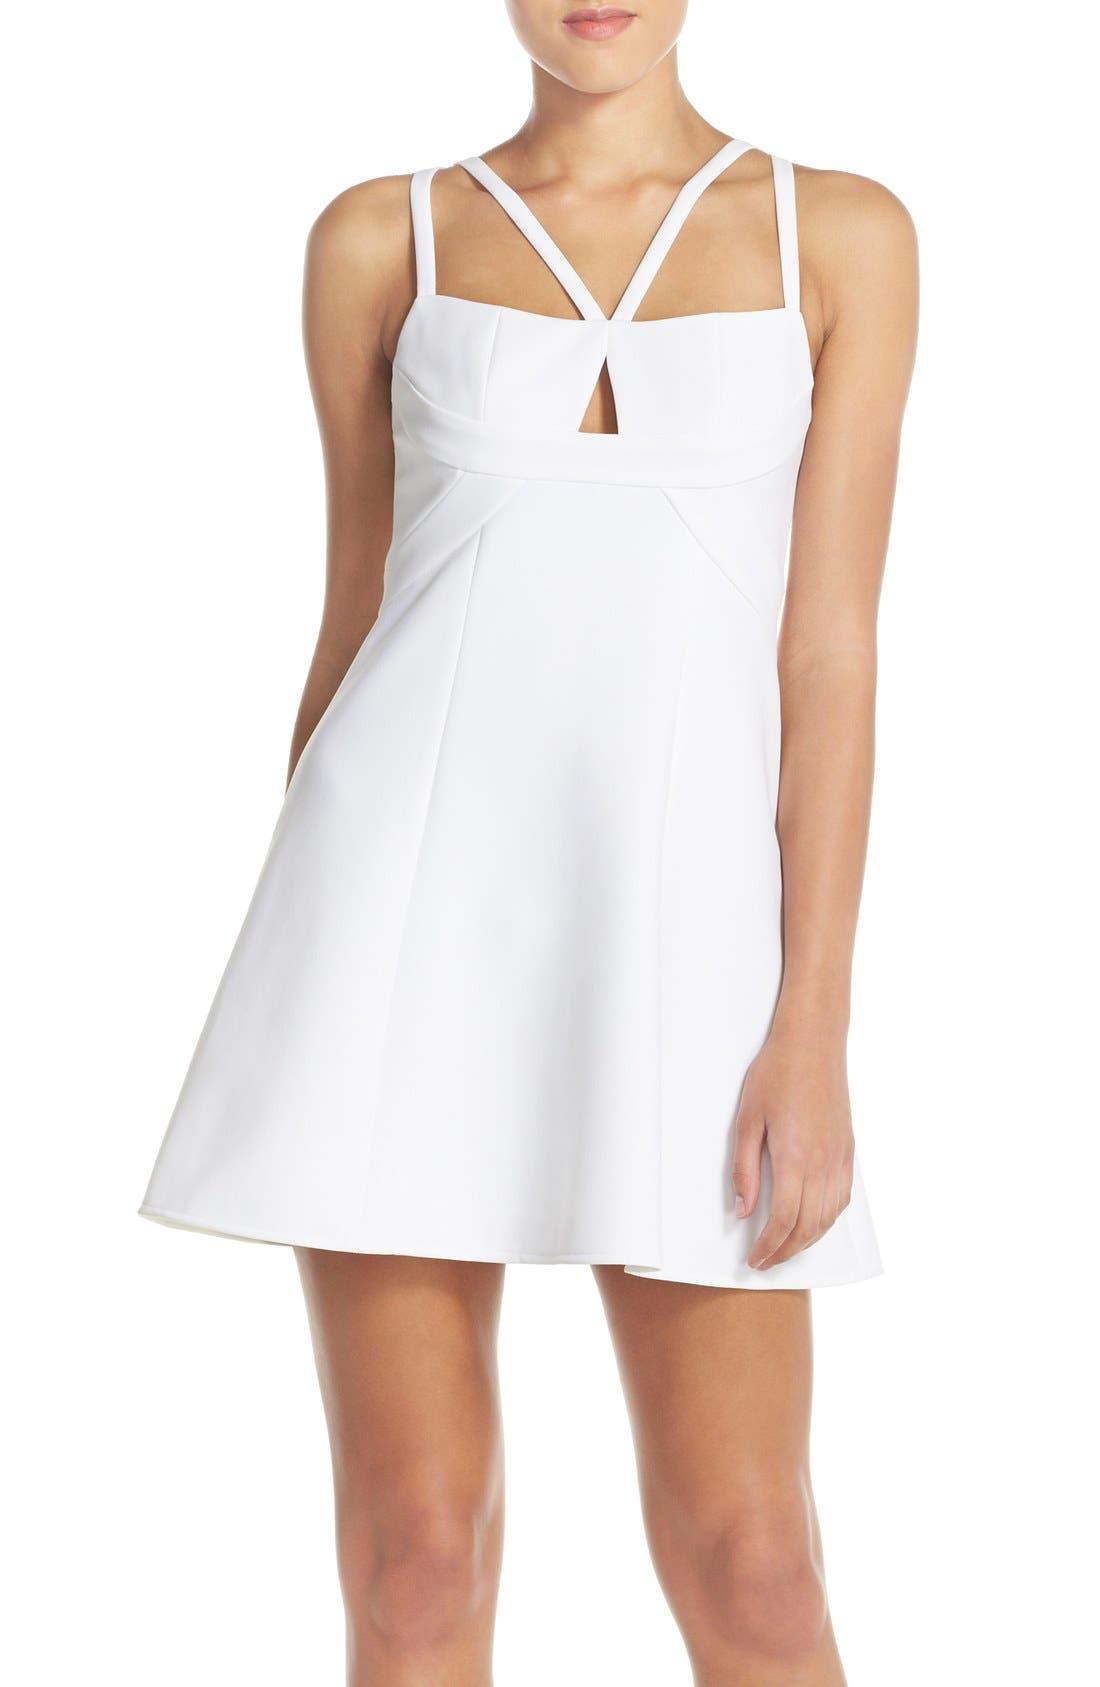 Alternate Image 1 Selected - BCBGMAXAZRIA 'Charlot' Cutout Crepe Fit & Flare Dress